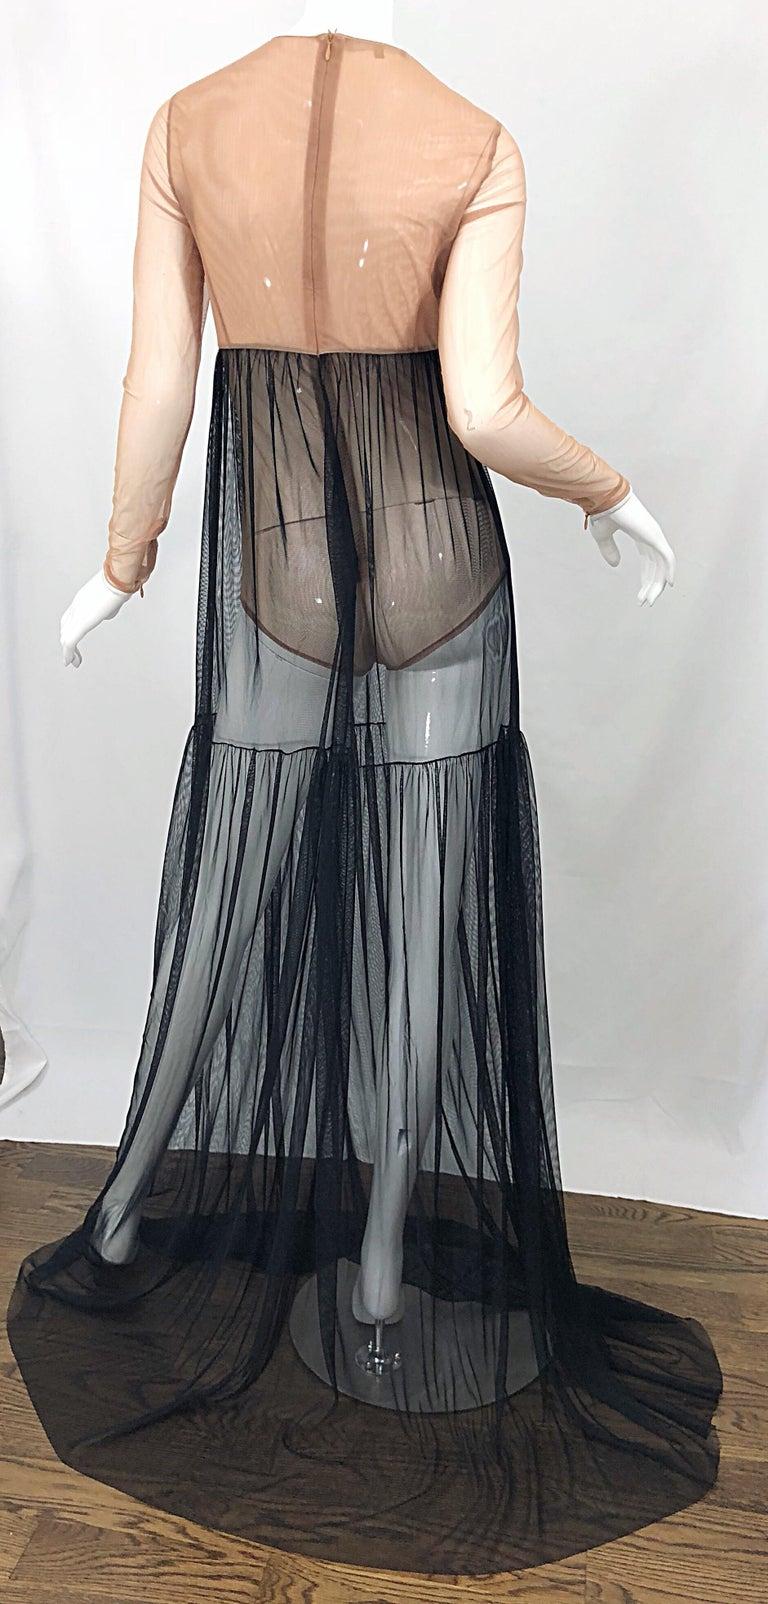 Michael Kors Collection Sz 4 Nude + Black Sheer Runway Mesh Bodysuit Gown Dress For Sale 5